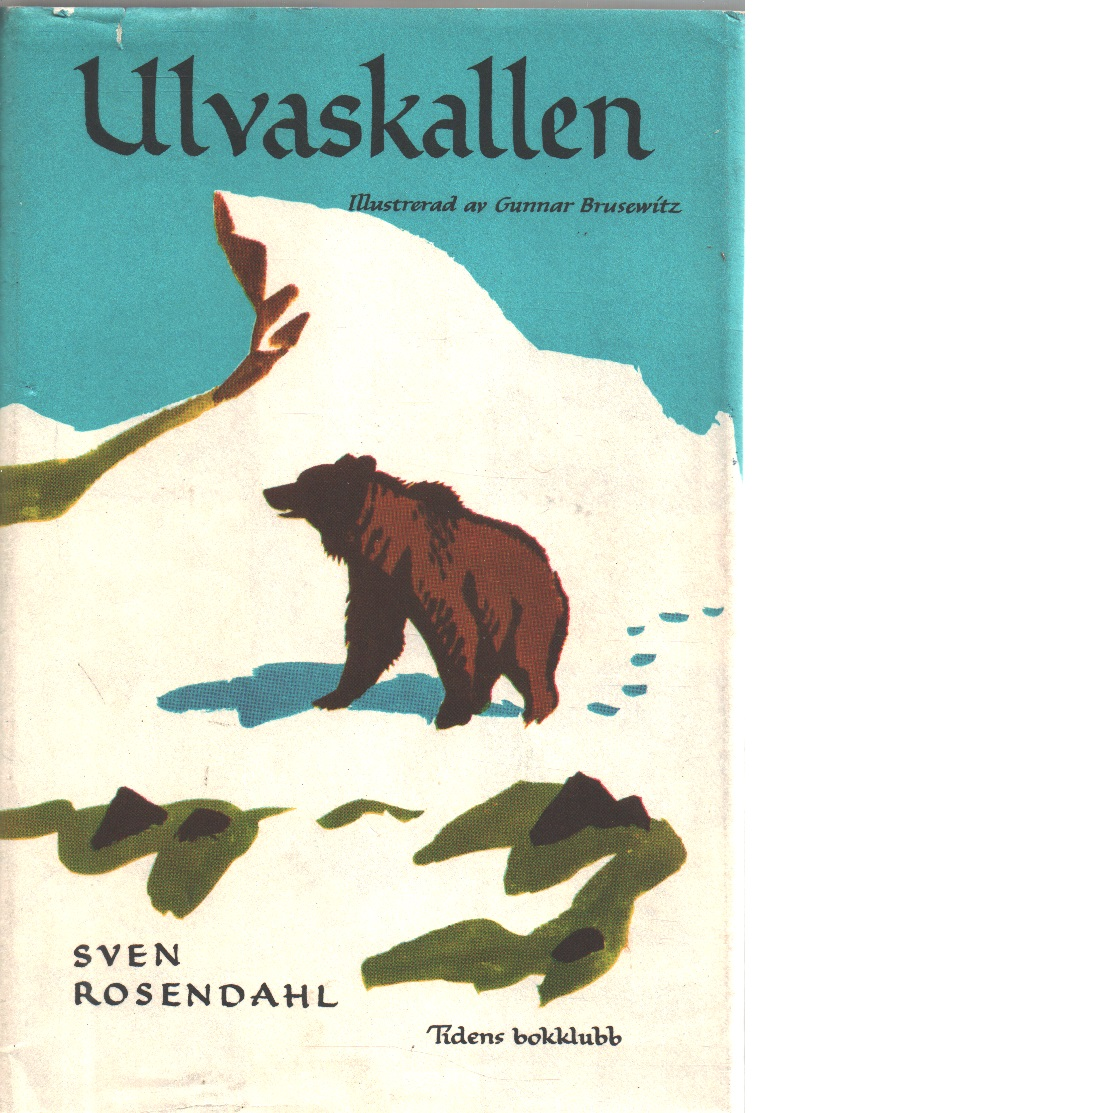 Ulvaskallen - Rosendahl, Sven